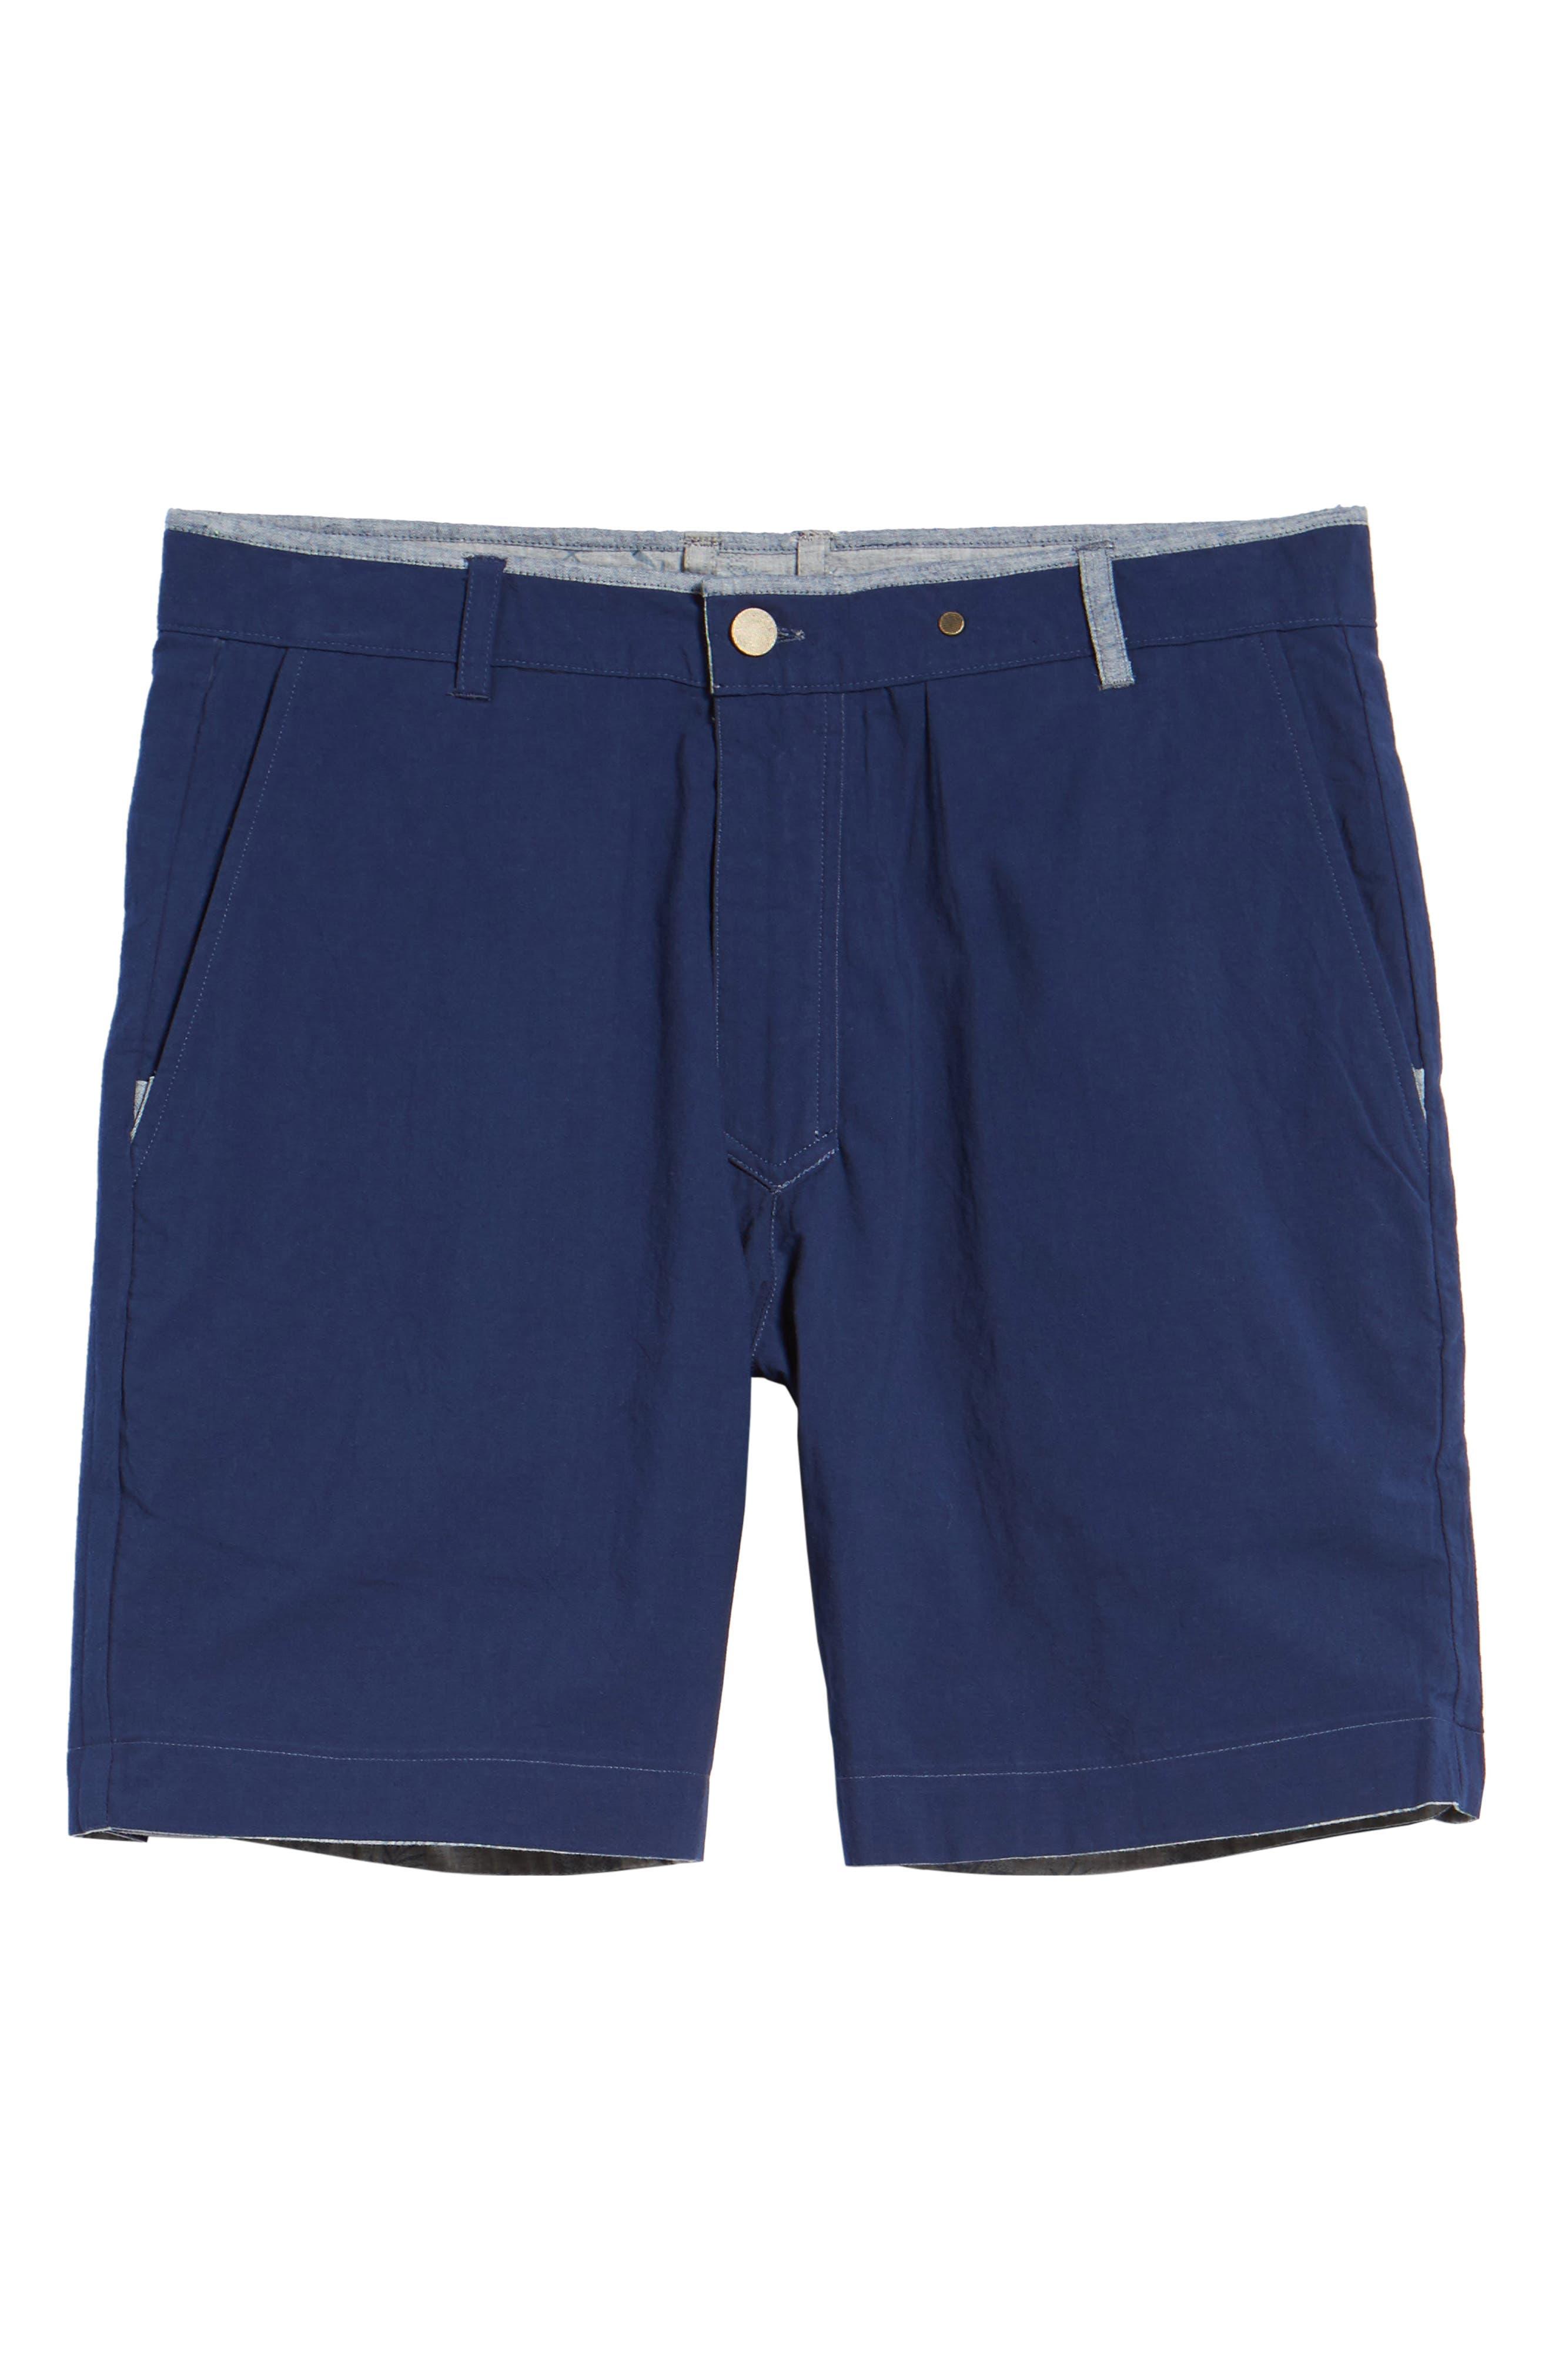 Rock Steady Reversible Shorts,                             Alternate thumbnail 6, color,                             Grey